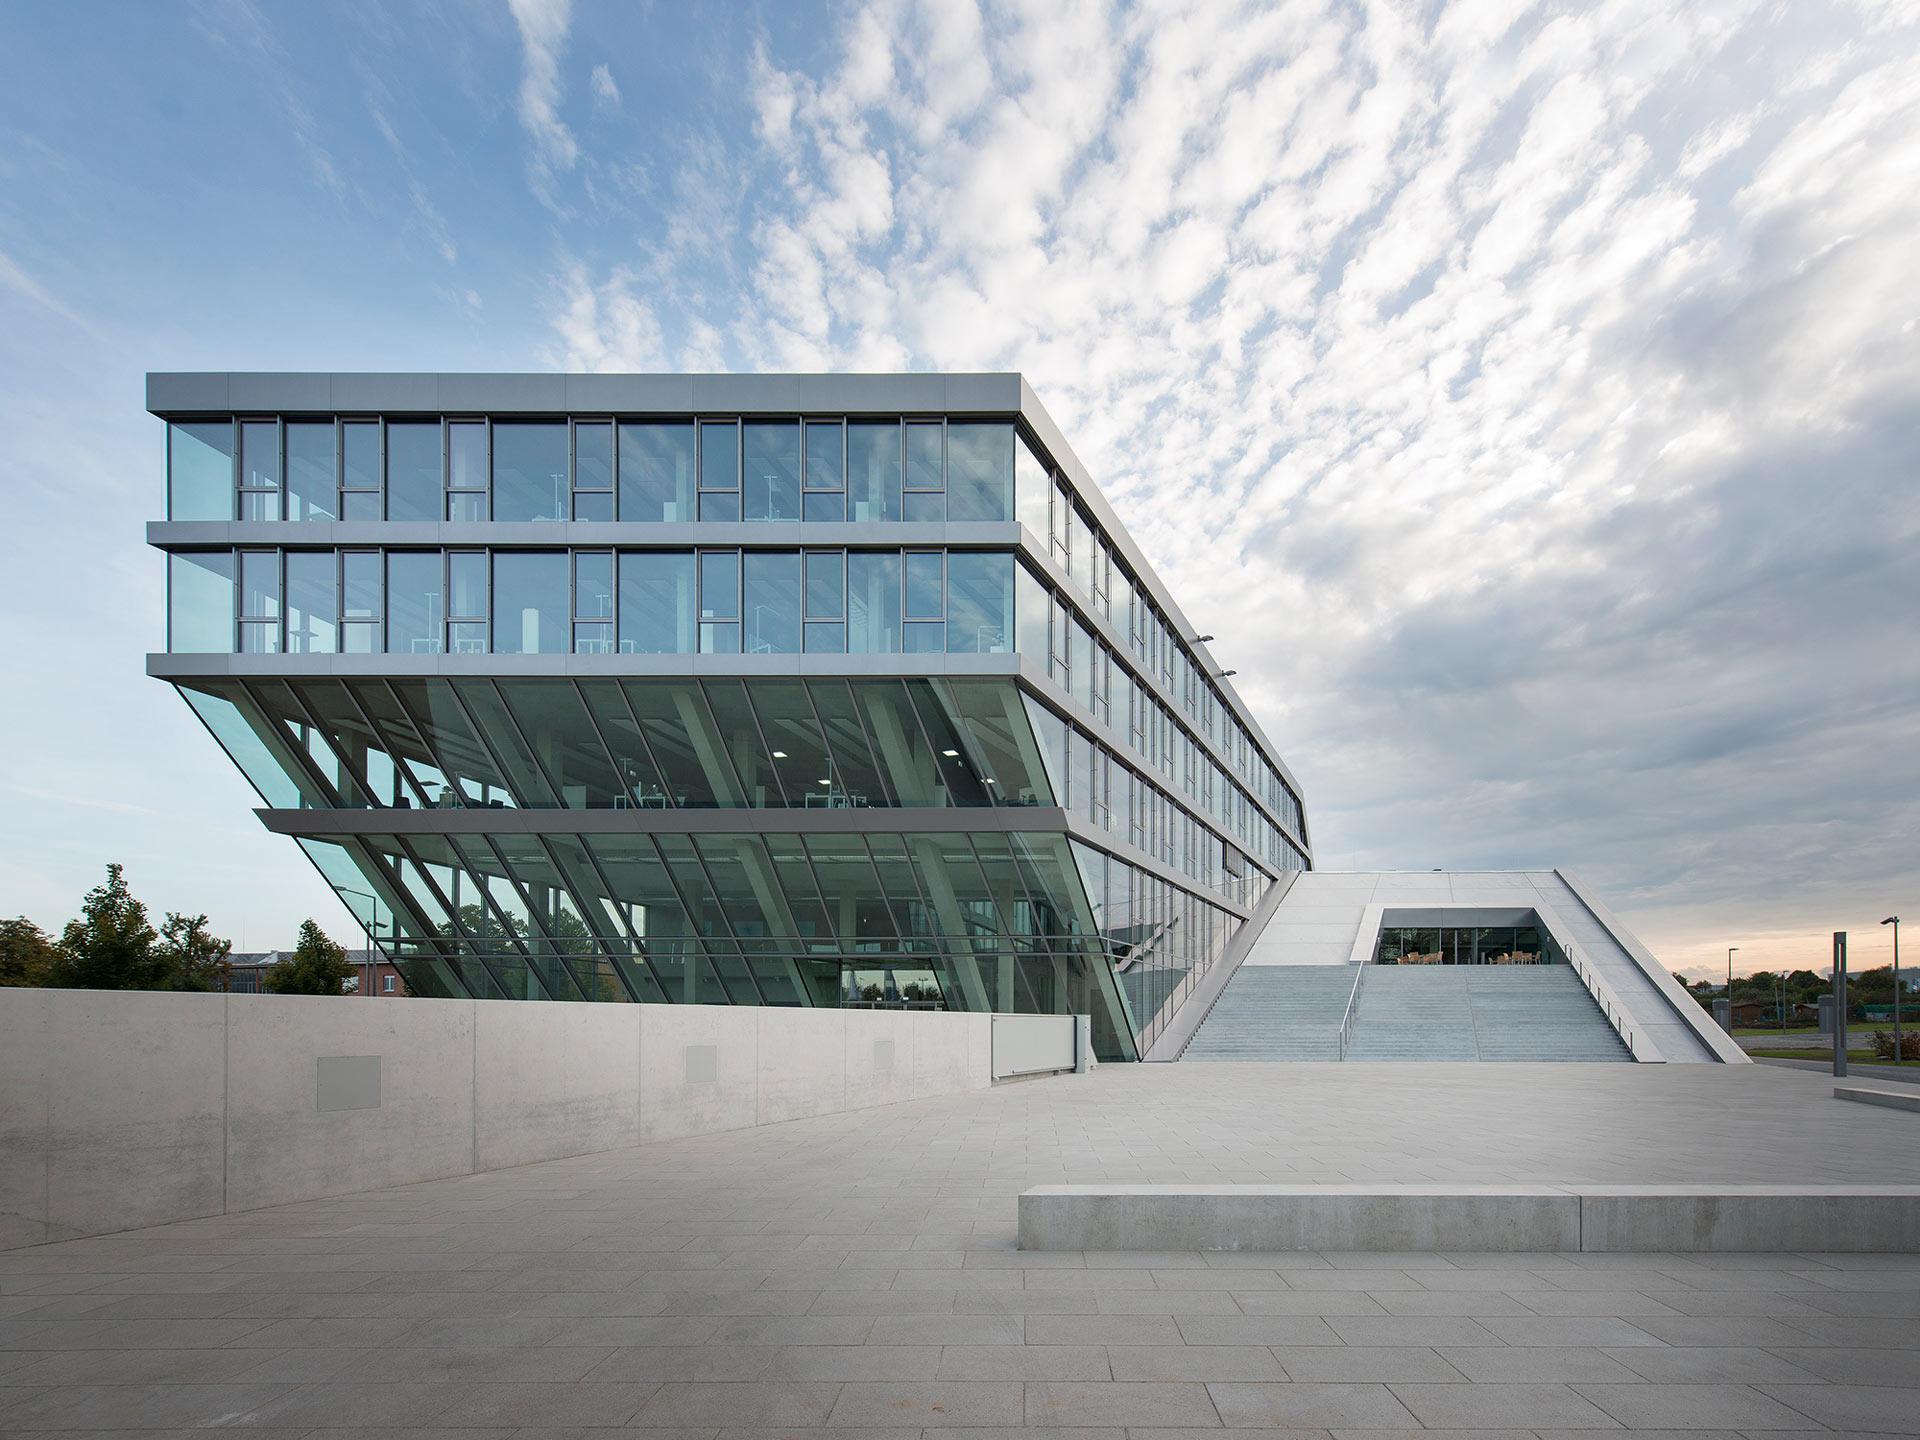 Hahn & Kolb Logistikzentrum